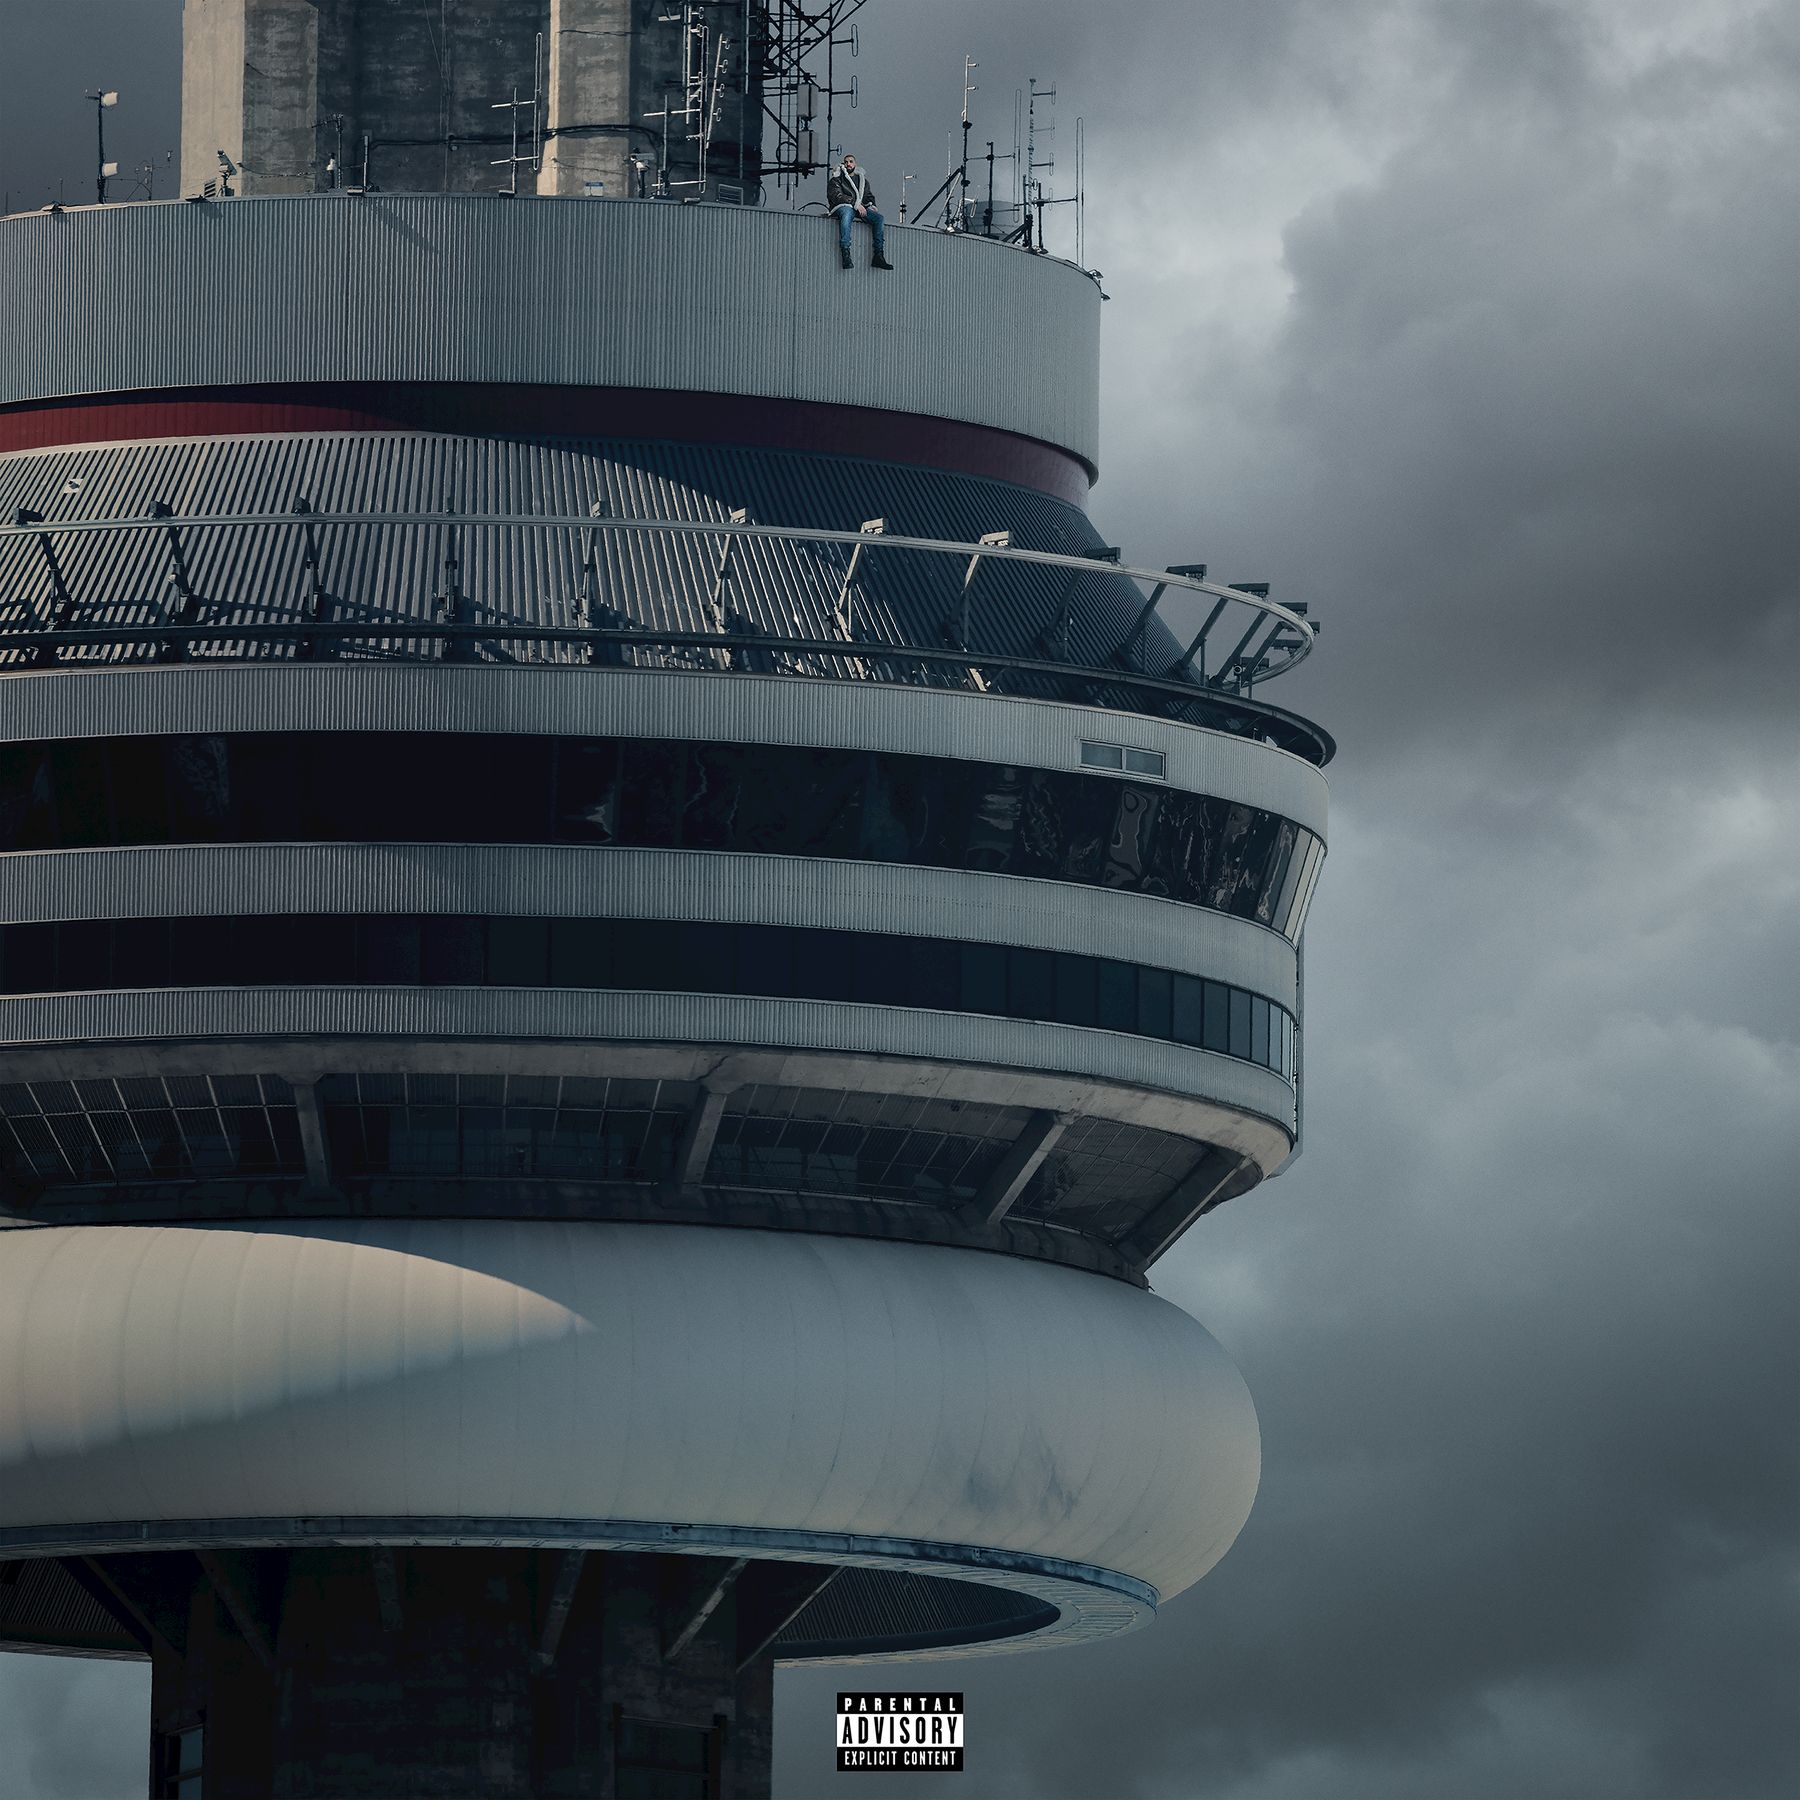 Drake - Views album cover